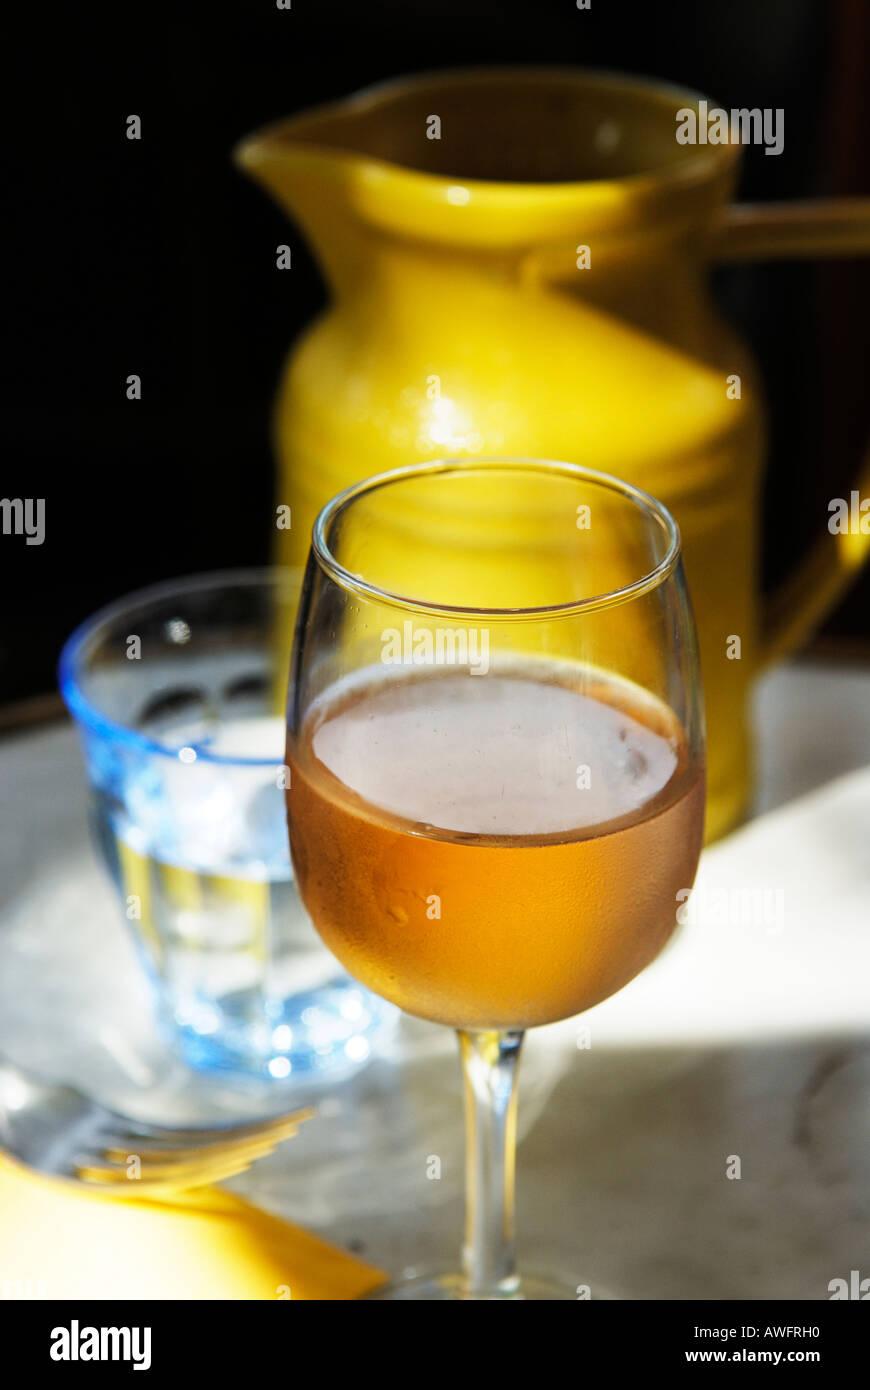 Vin gris y amarillo garrafa de agua Imagen De Stock